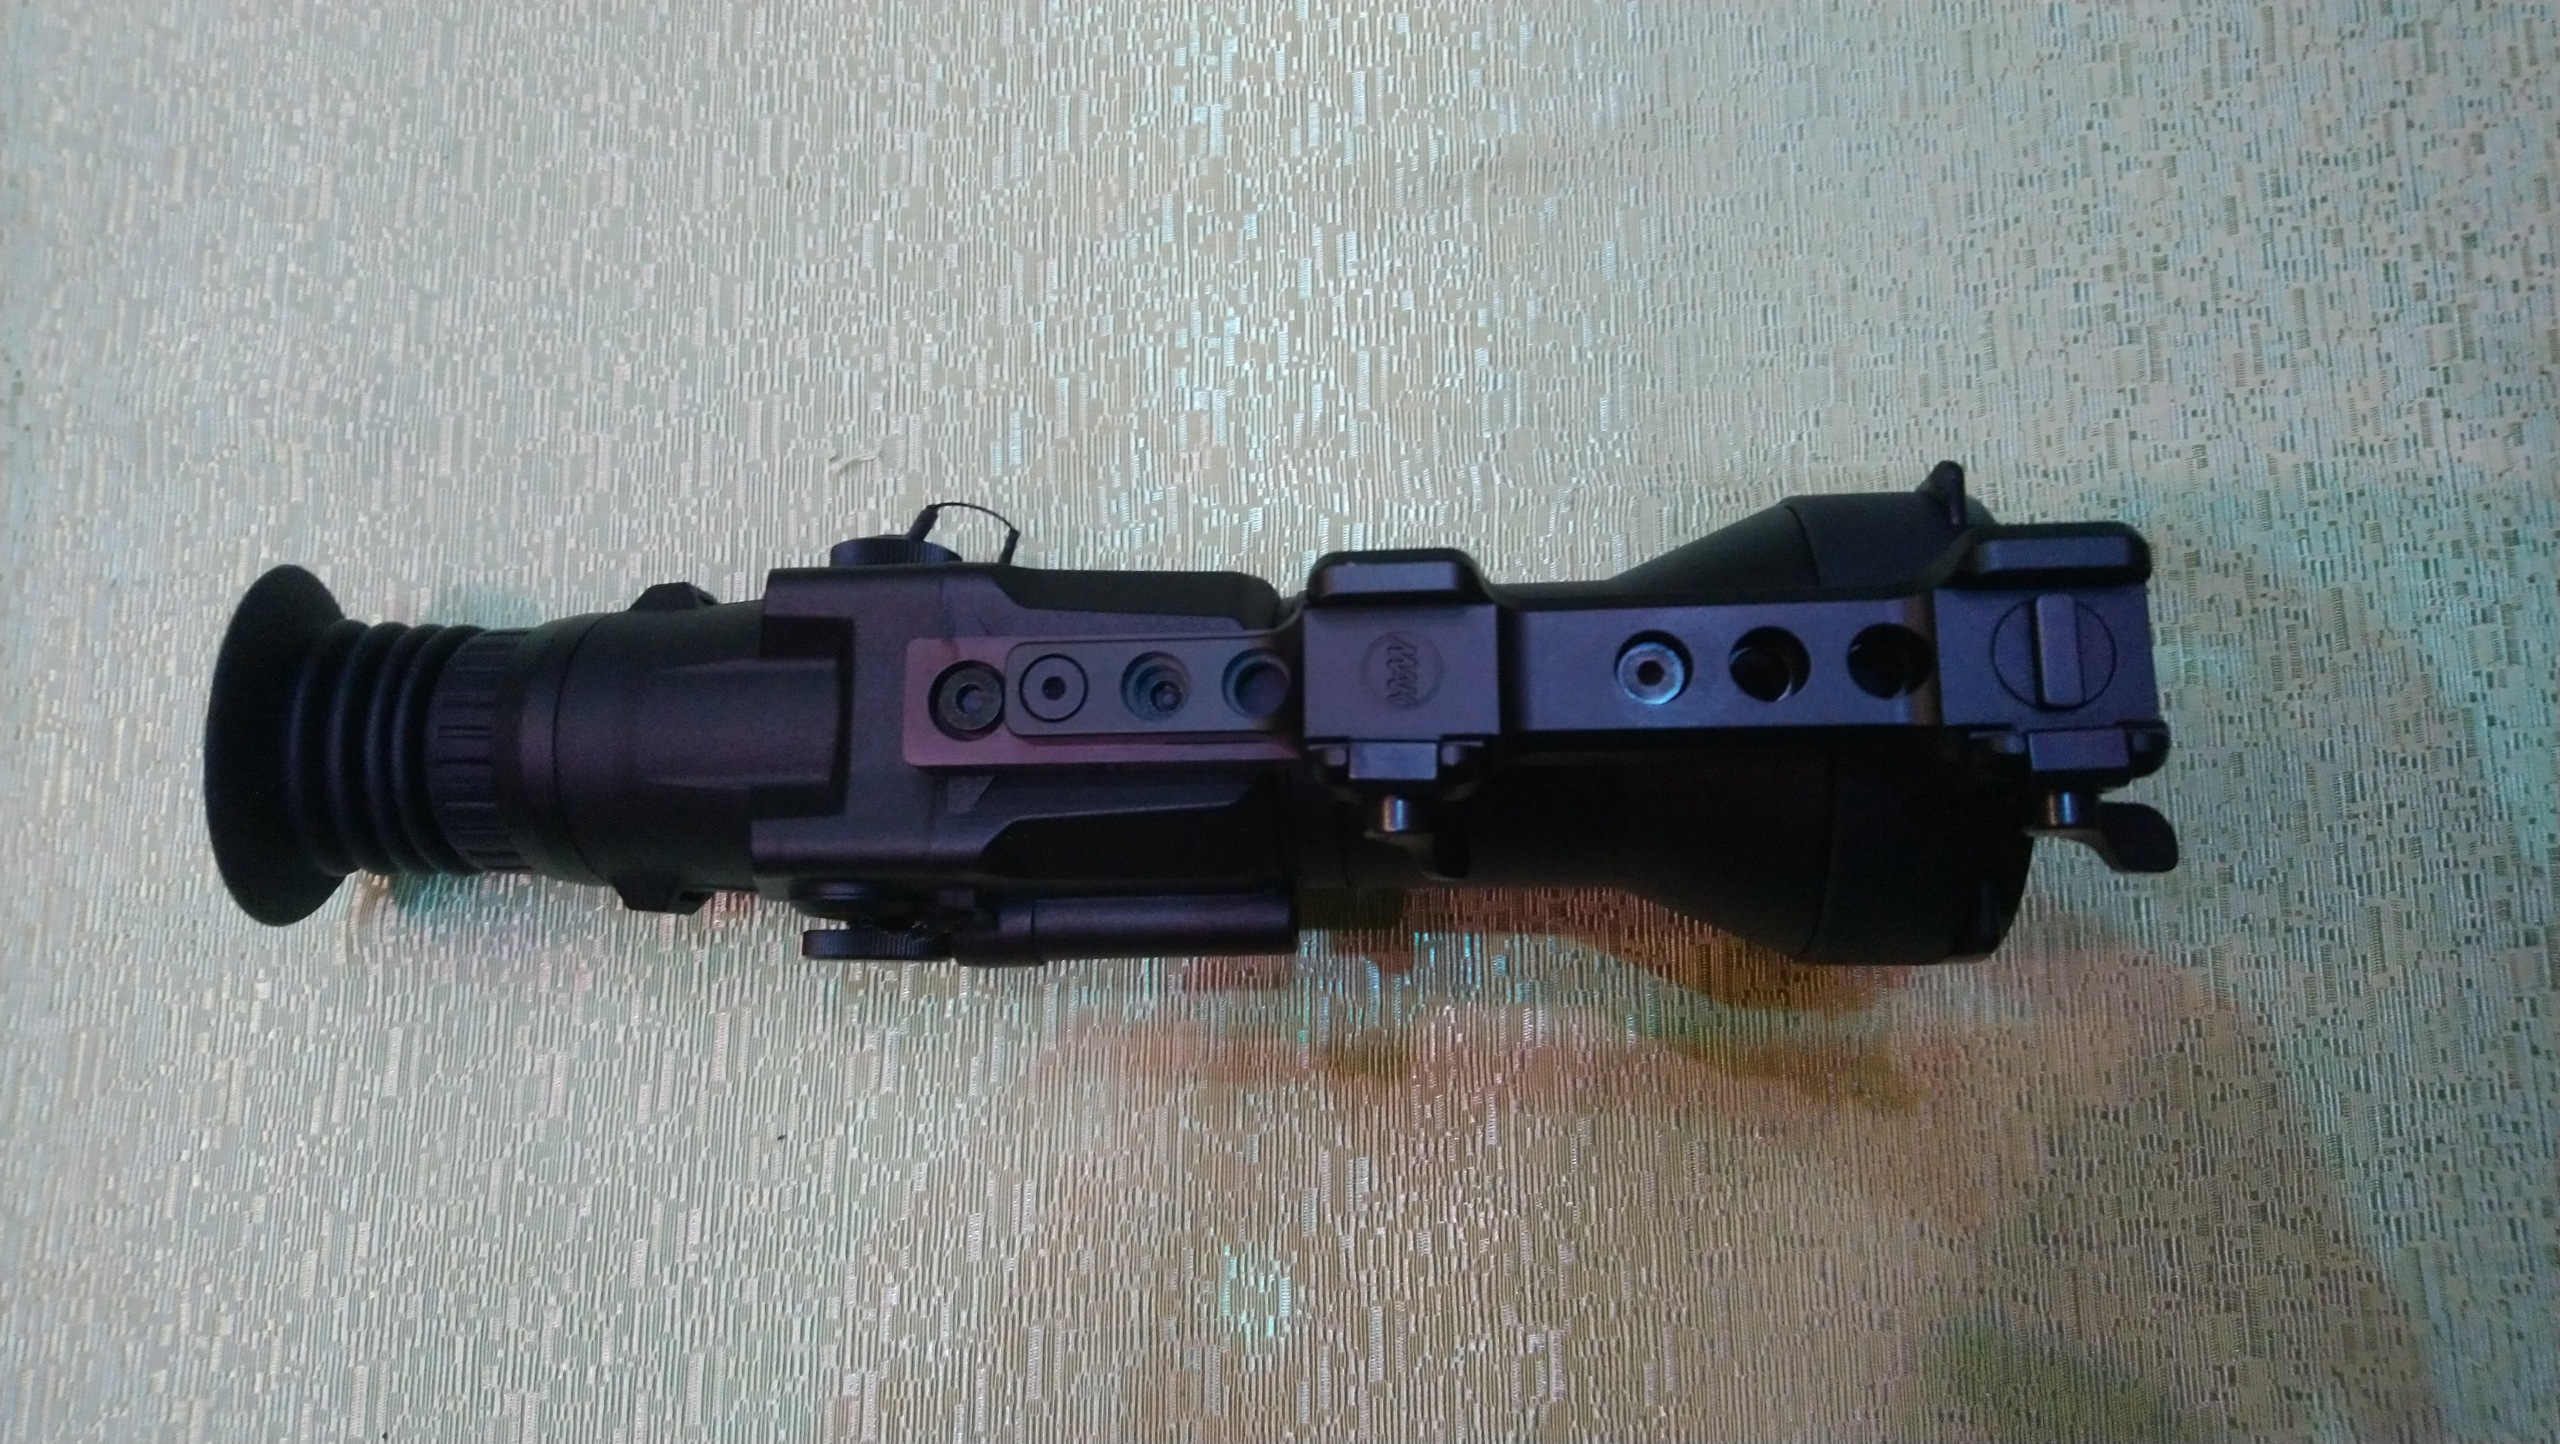 тепловизионный охотничий прицел Dedal-T4.642 Pro